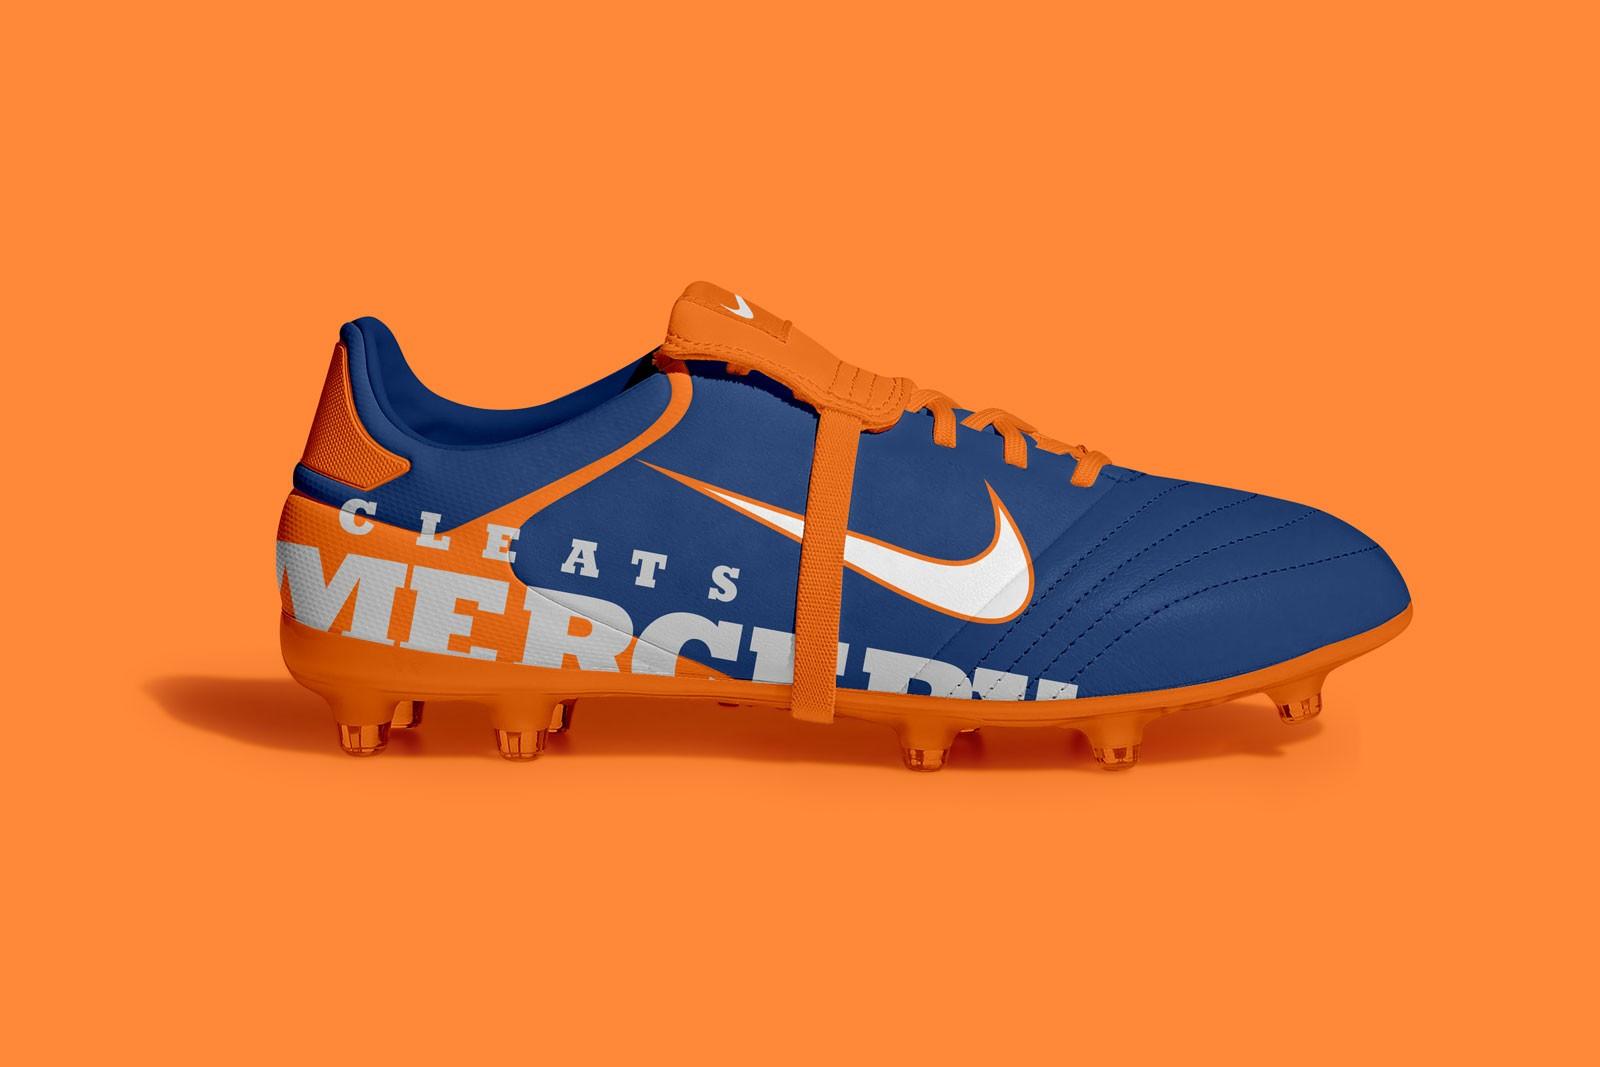 Free Soccer Shoes Mockup PSD